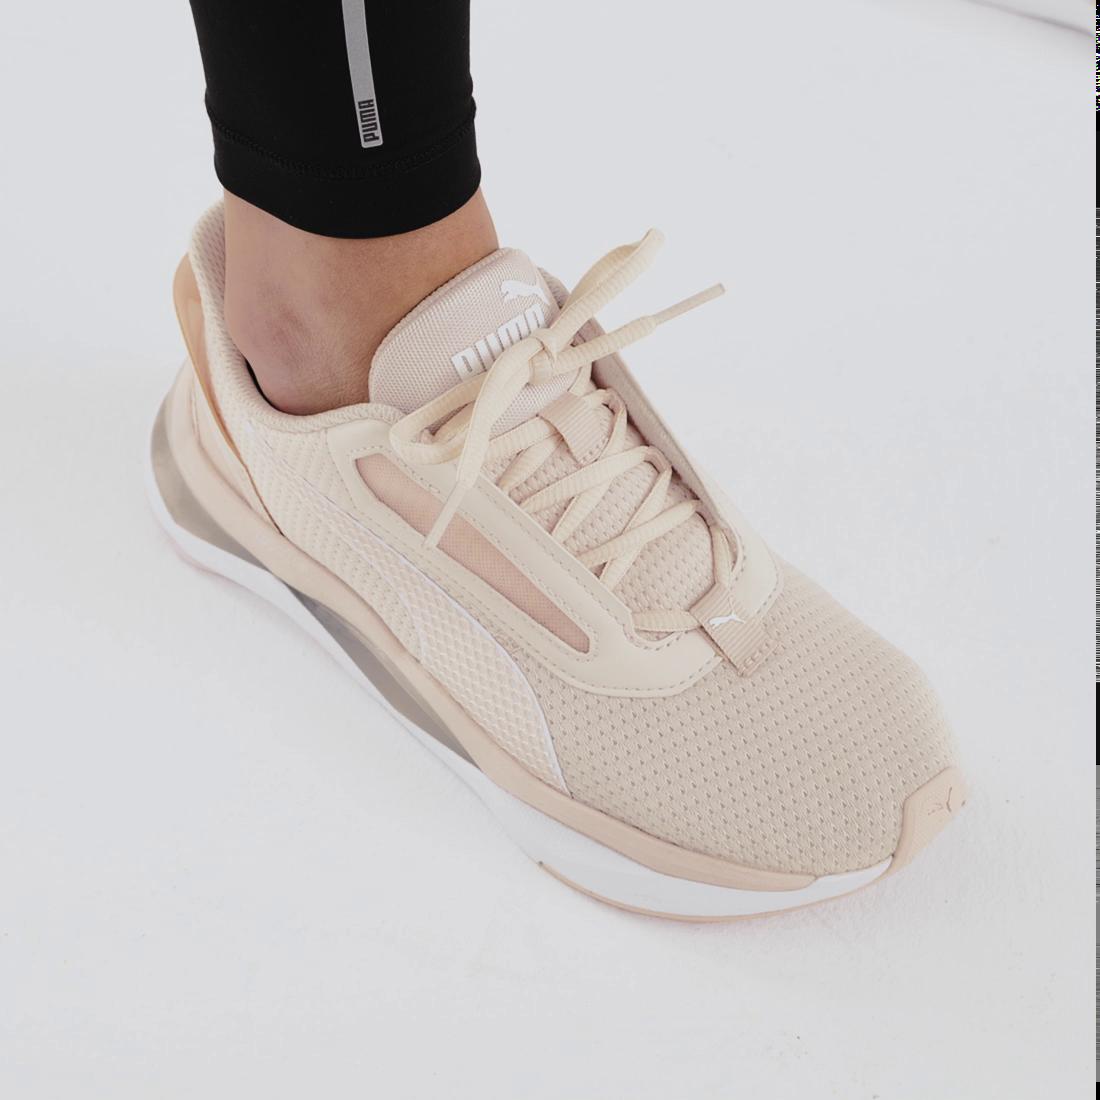 Image PUMA LQDCELL Shatter XT NC Women's Training Shoes #8